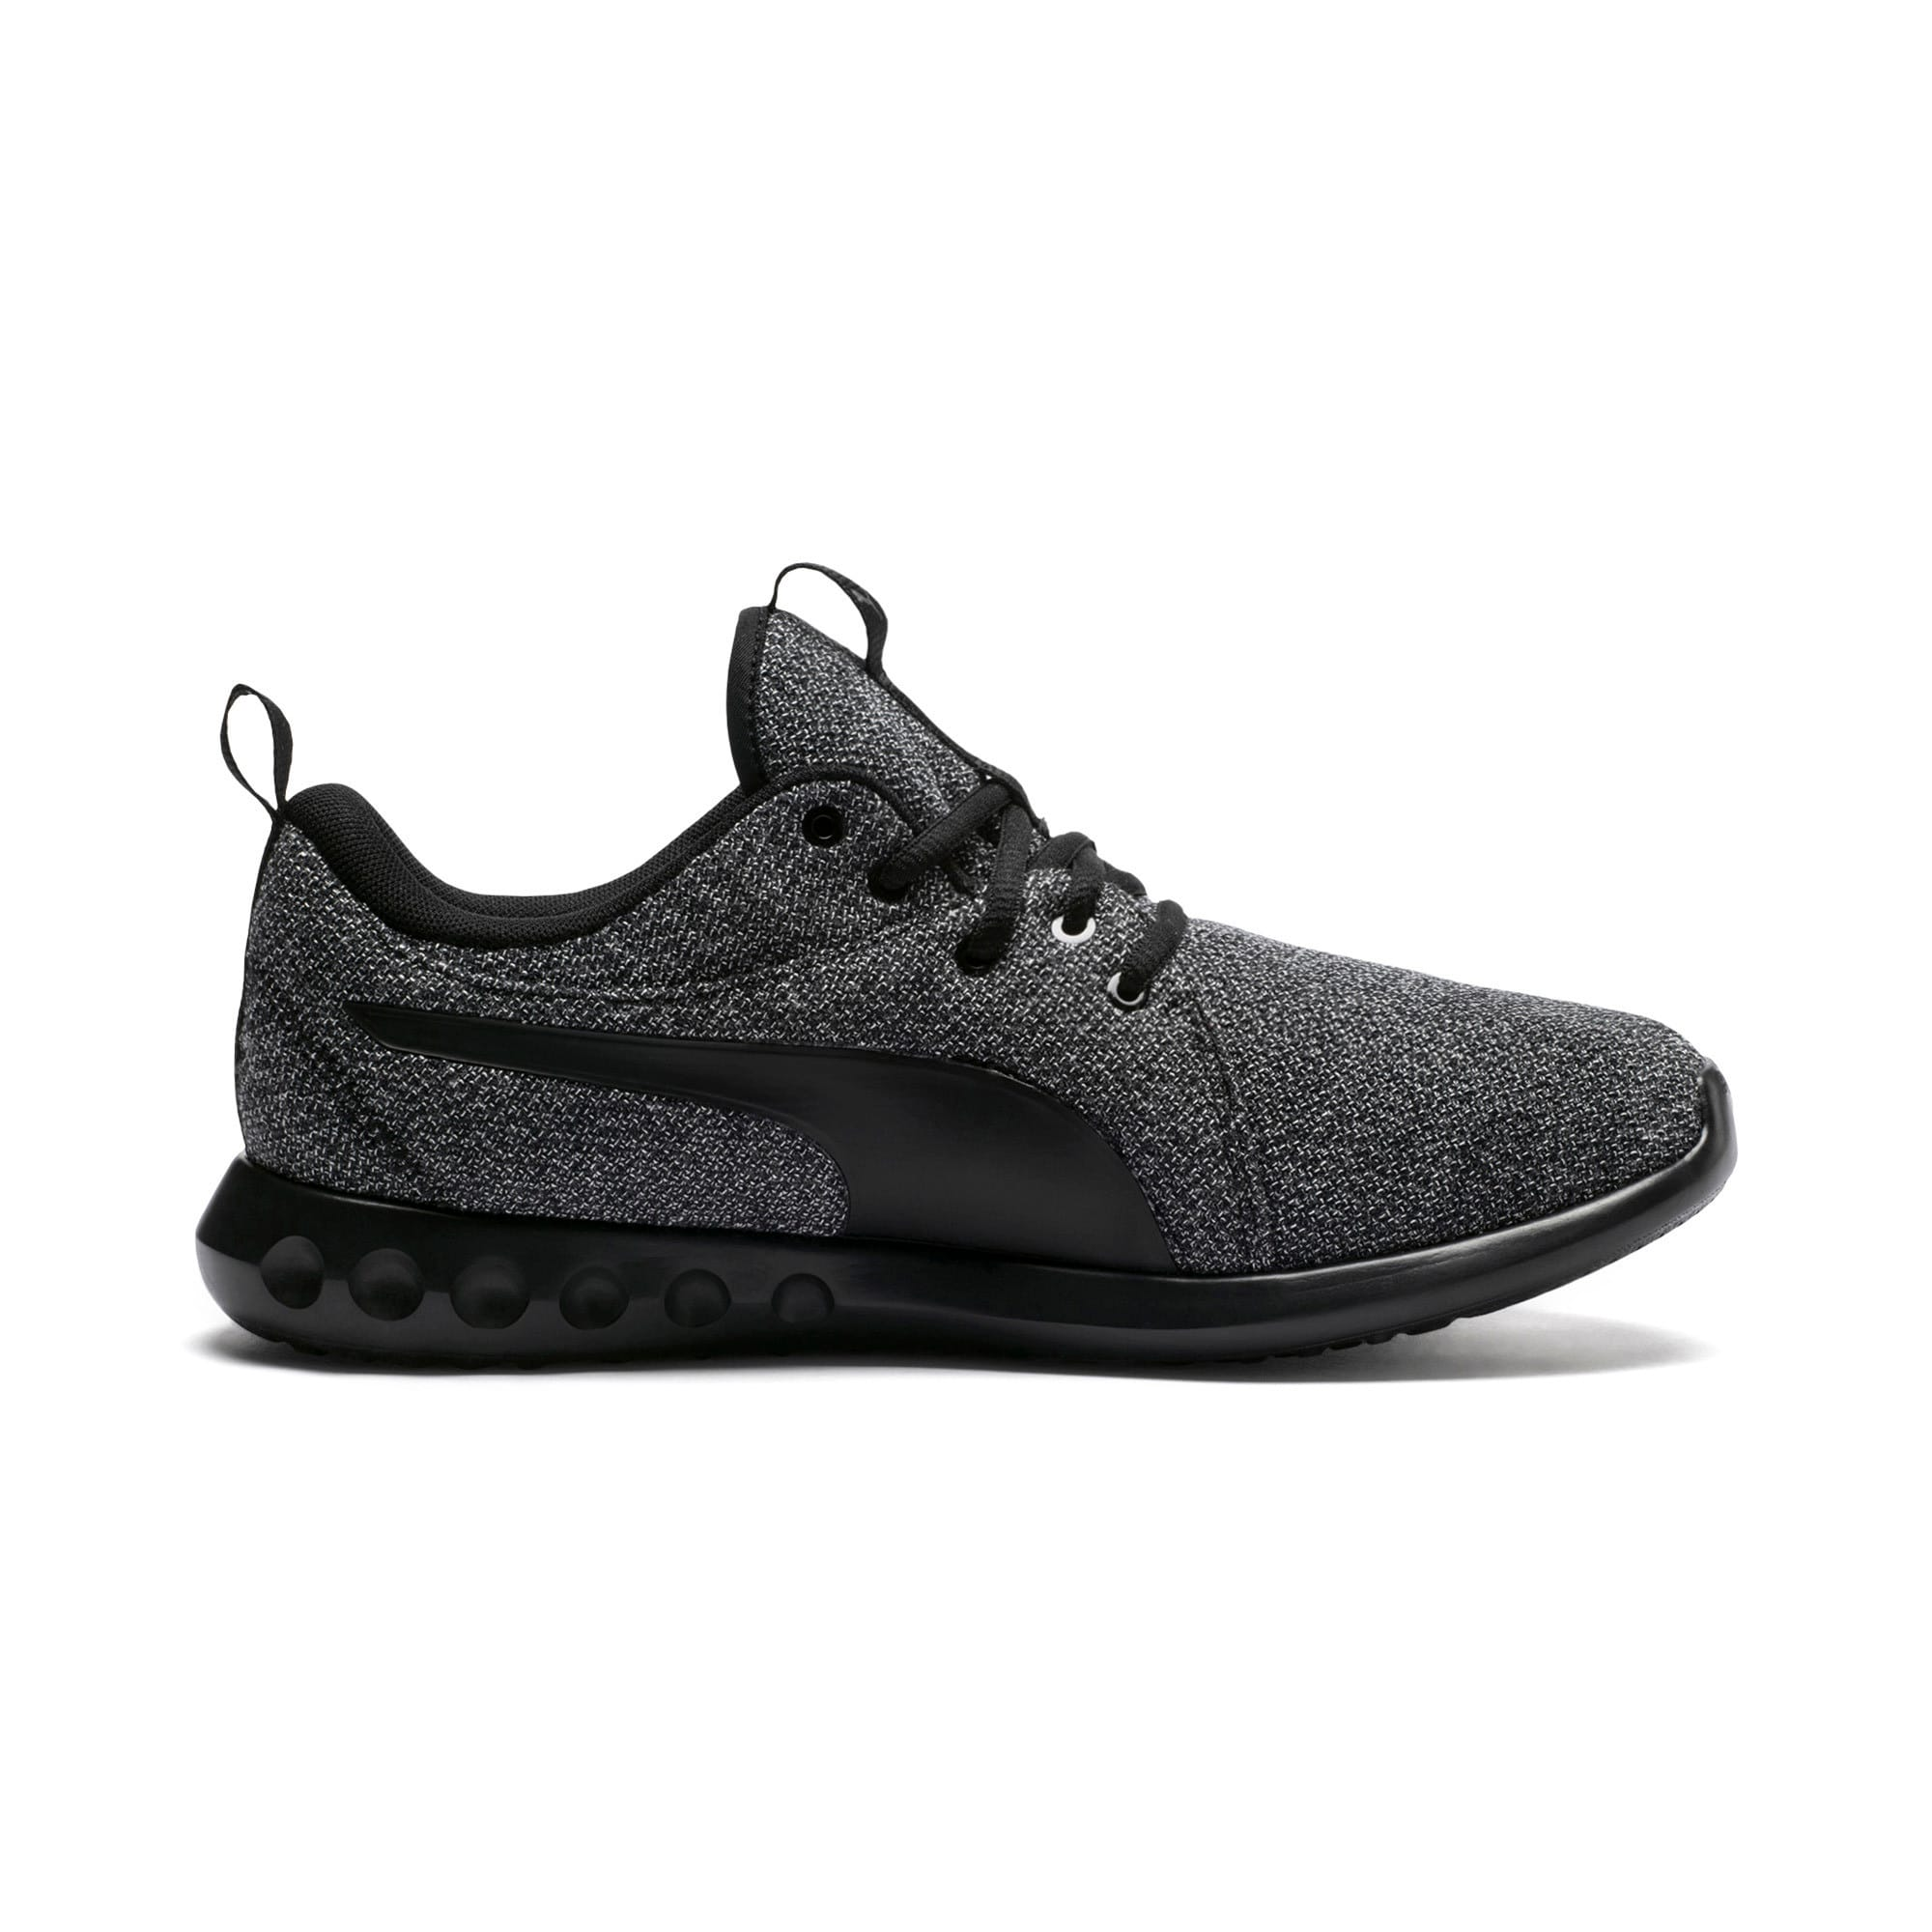 Thumbnail 5 of Carson 2 Knit Men's Training Shoes, Puma Black-Puma Black, medium